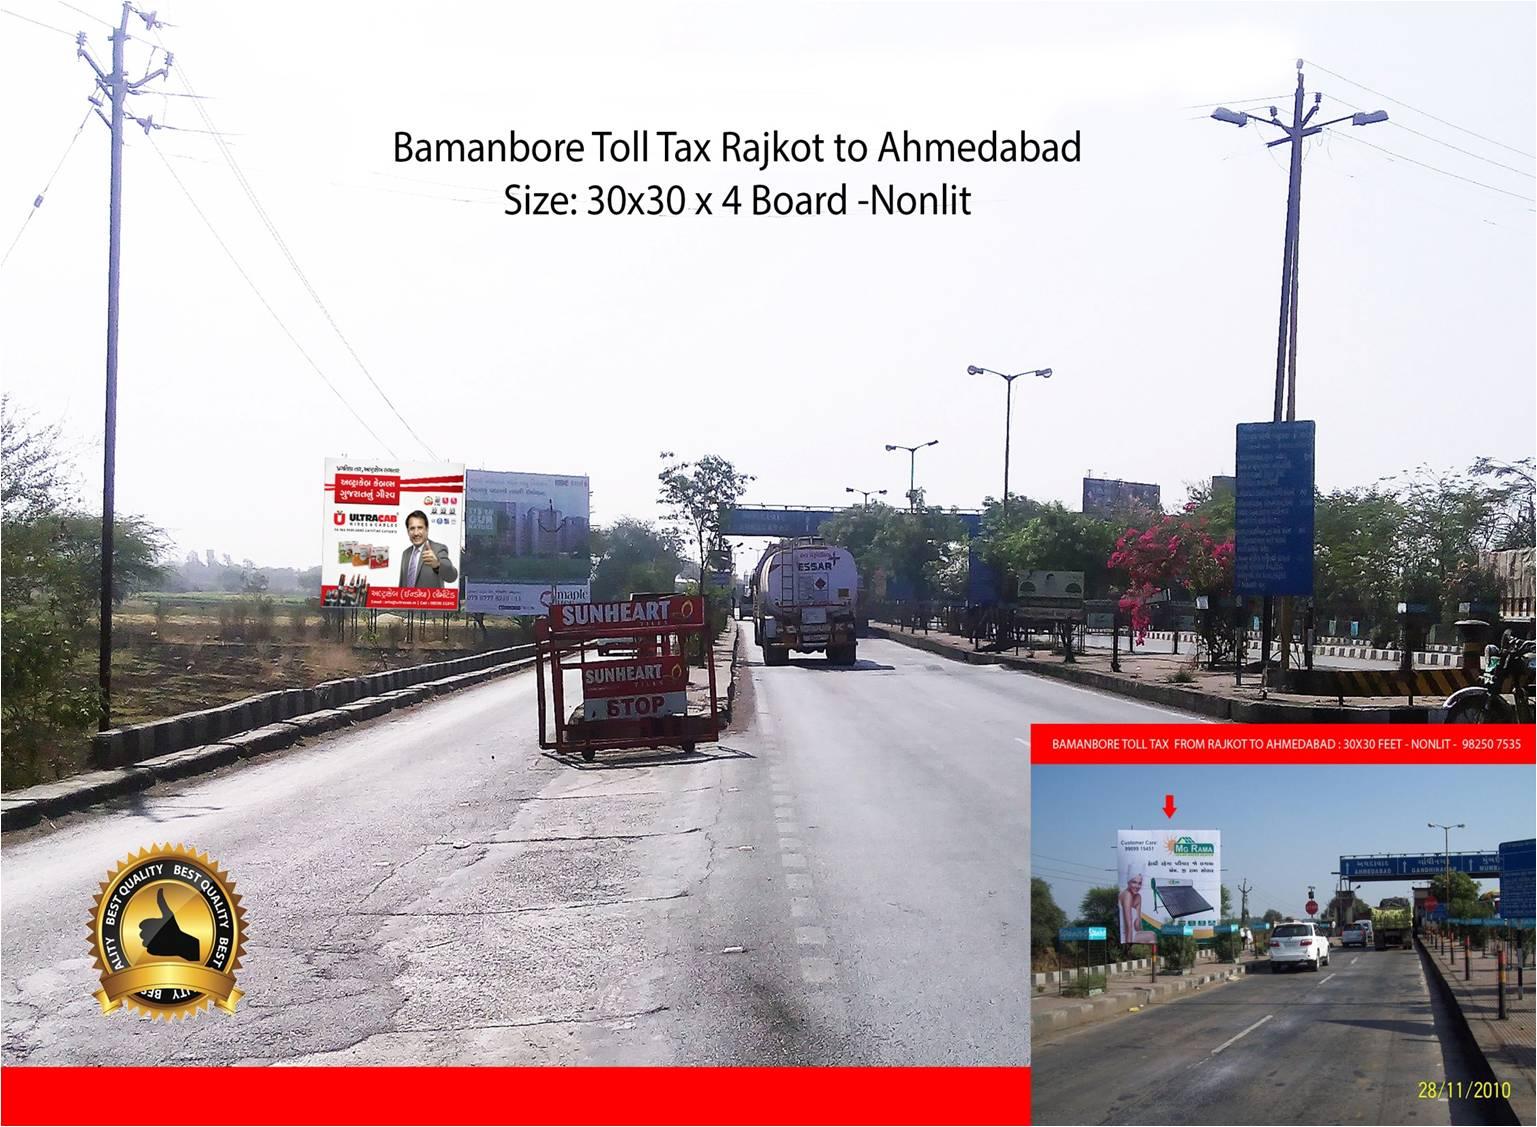 Bamanbore,Toll Tax Rajkot